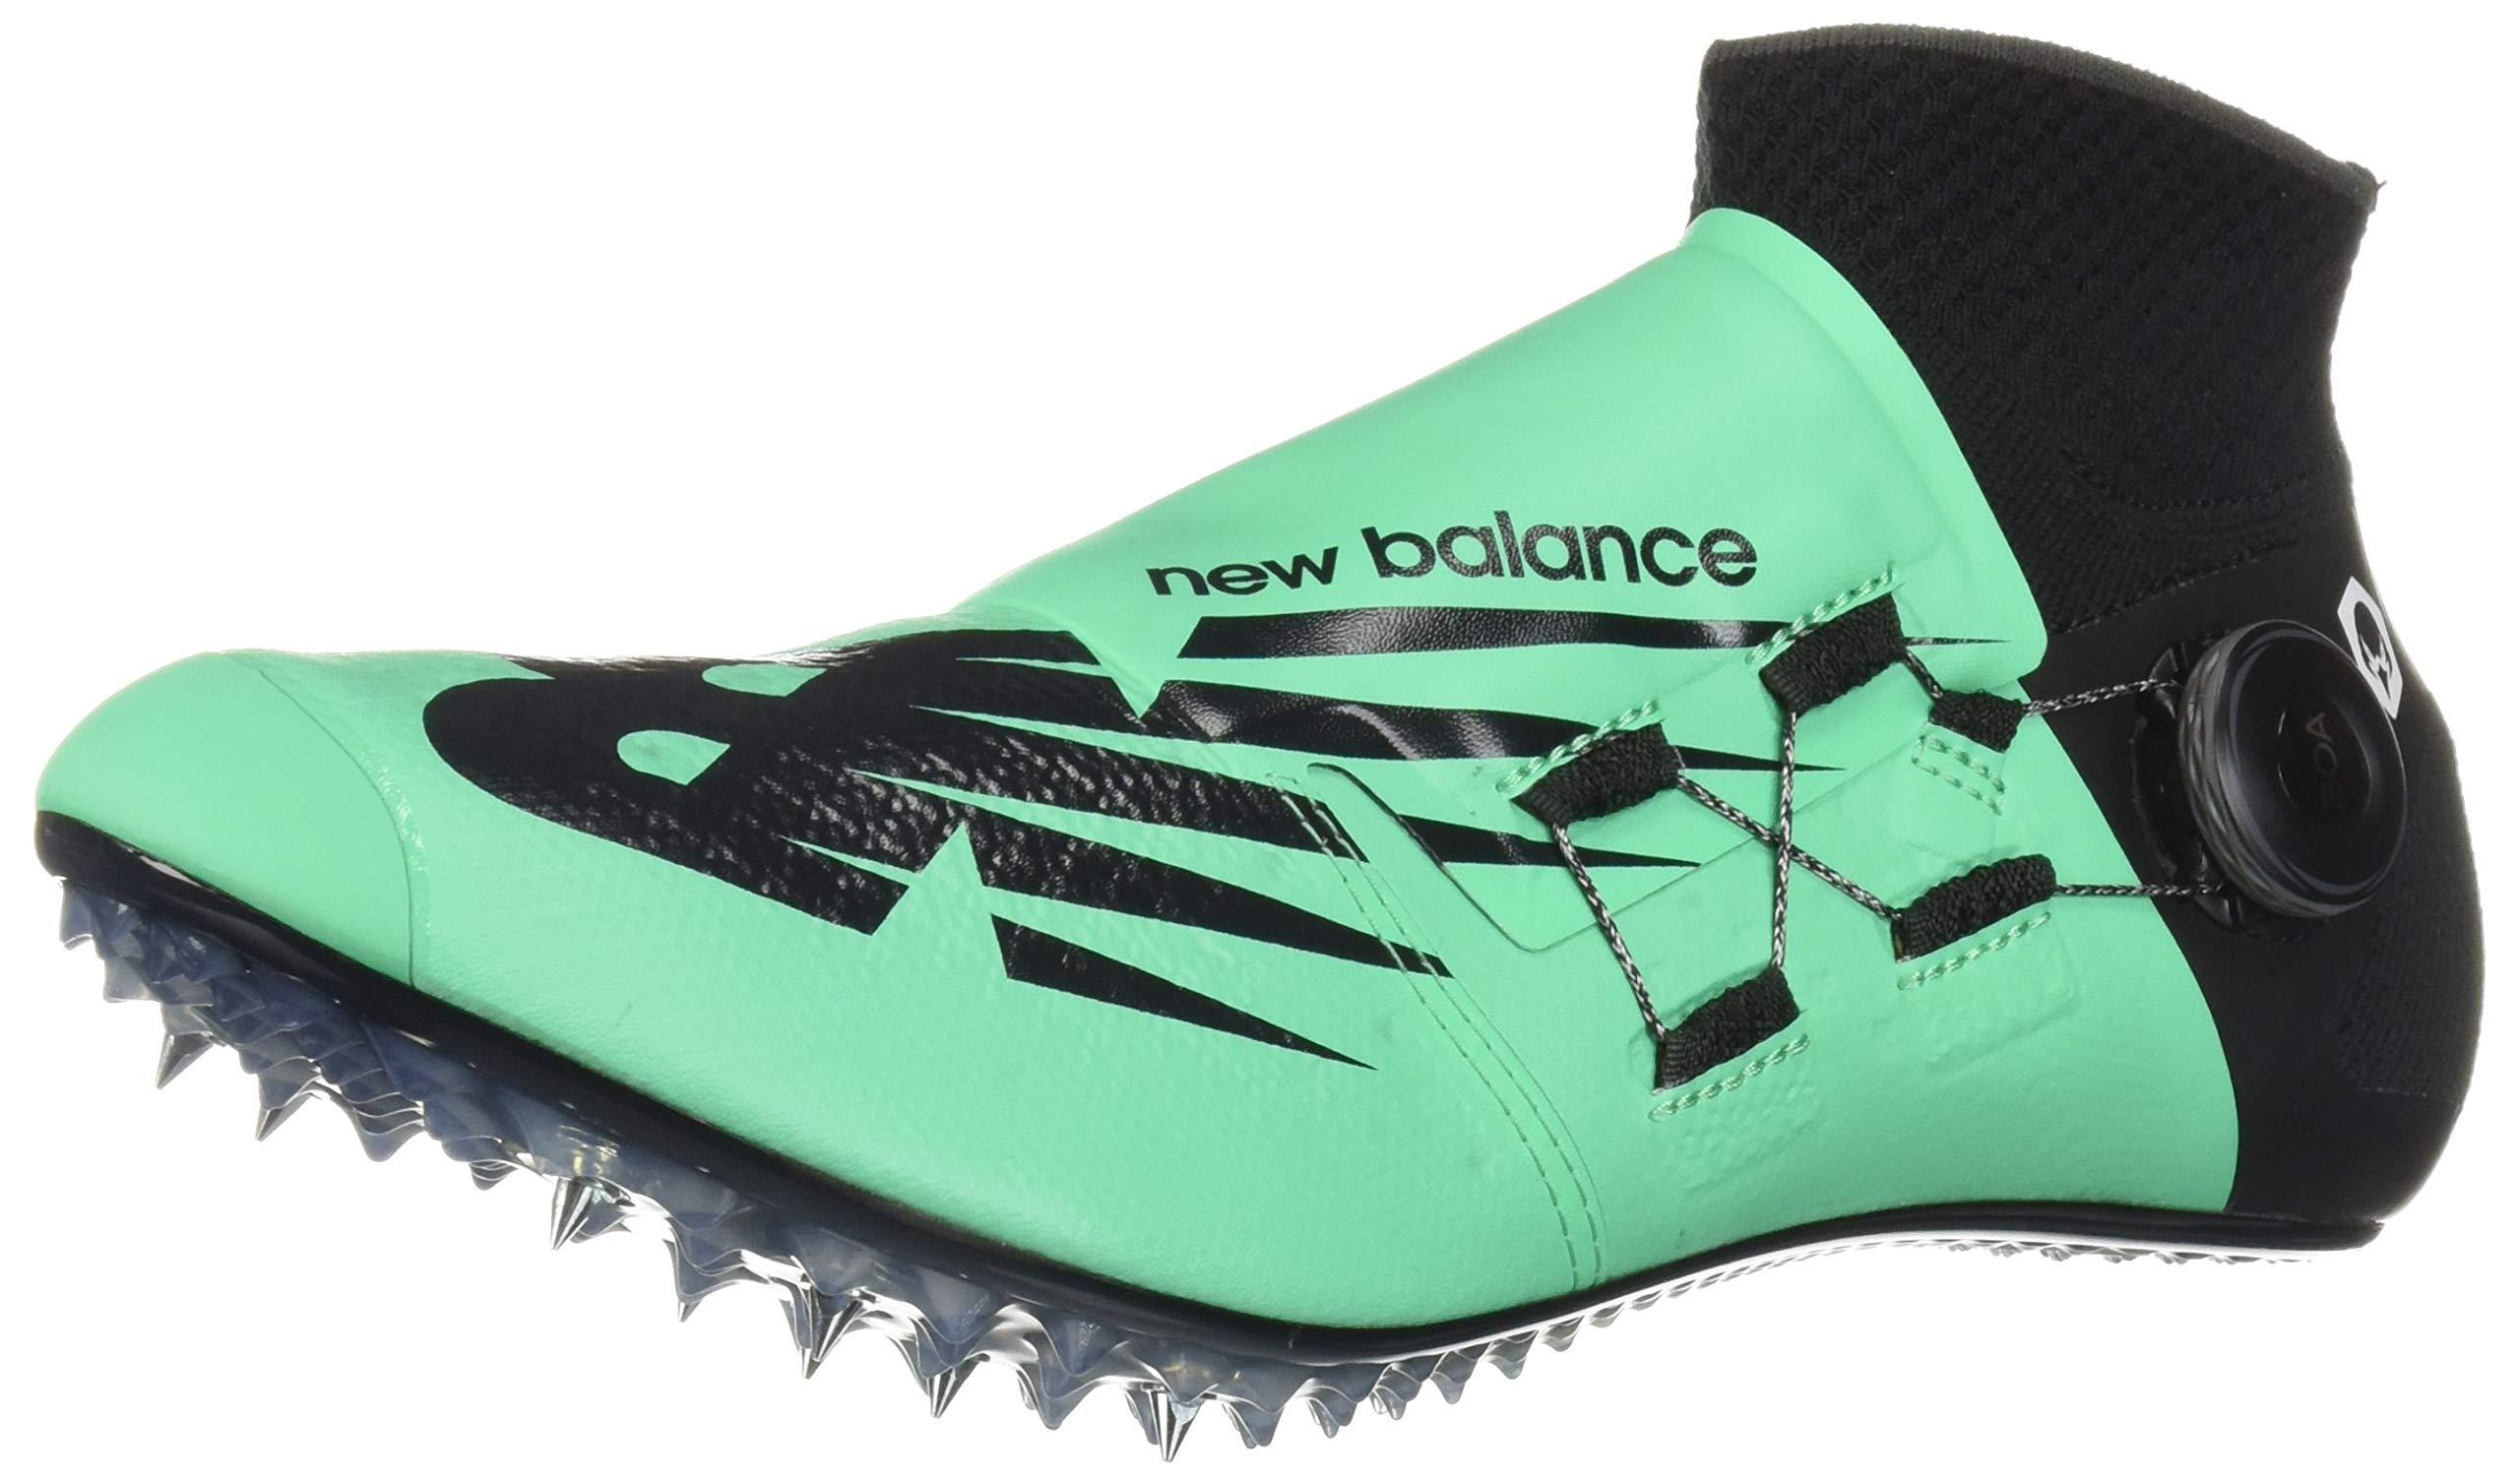 New Balance Men's Sigma Harmony Vazee Track Shoe neon Emerald/Black 5.5 D US by New Balance